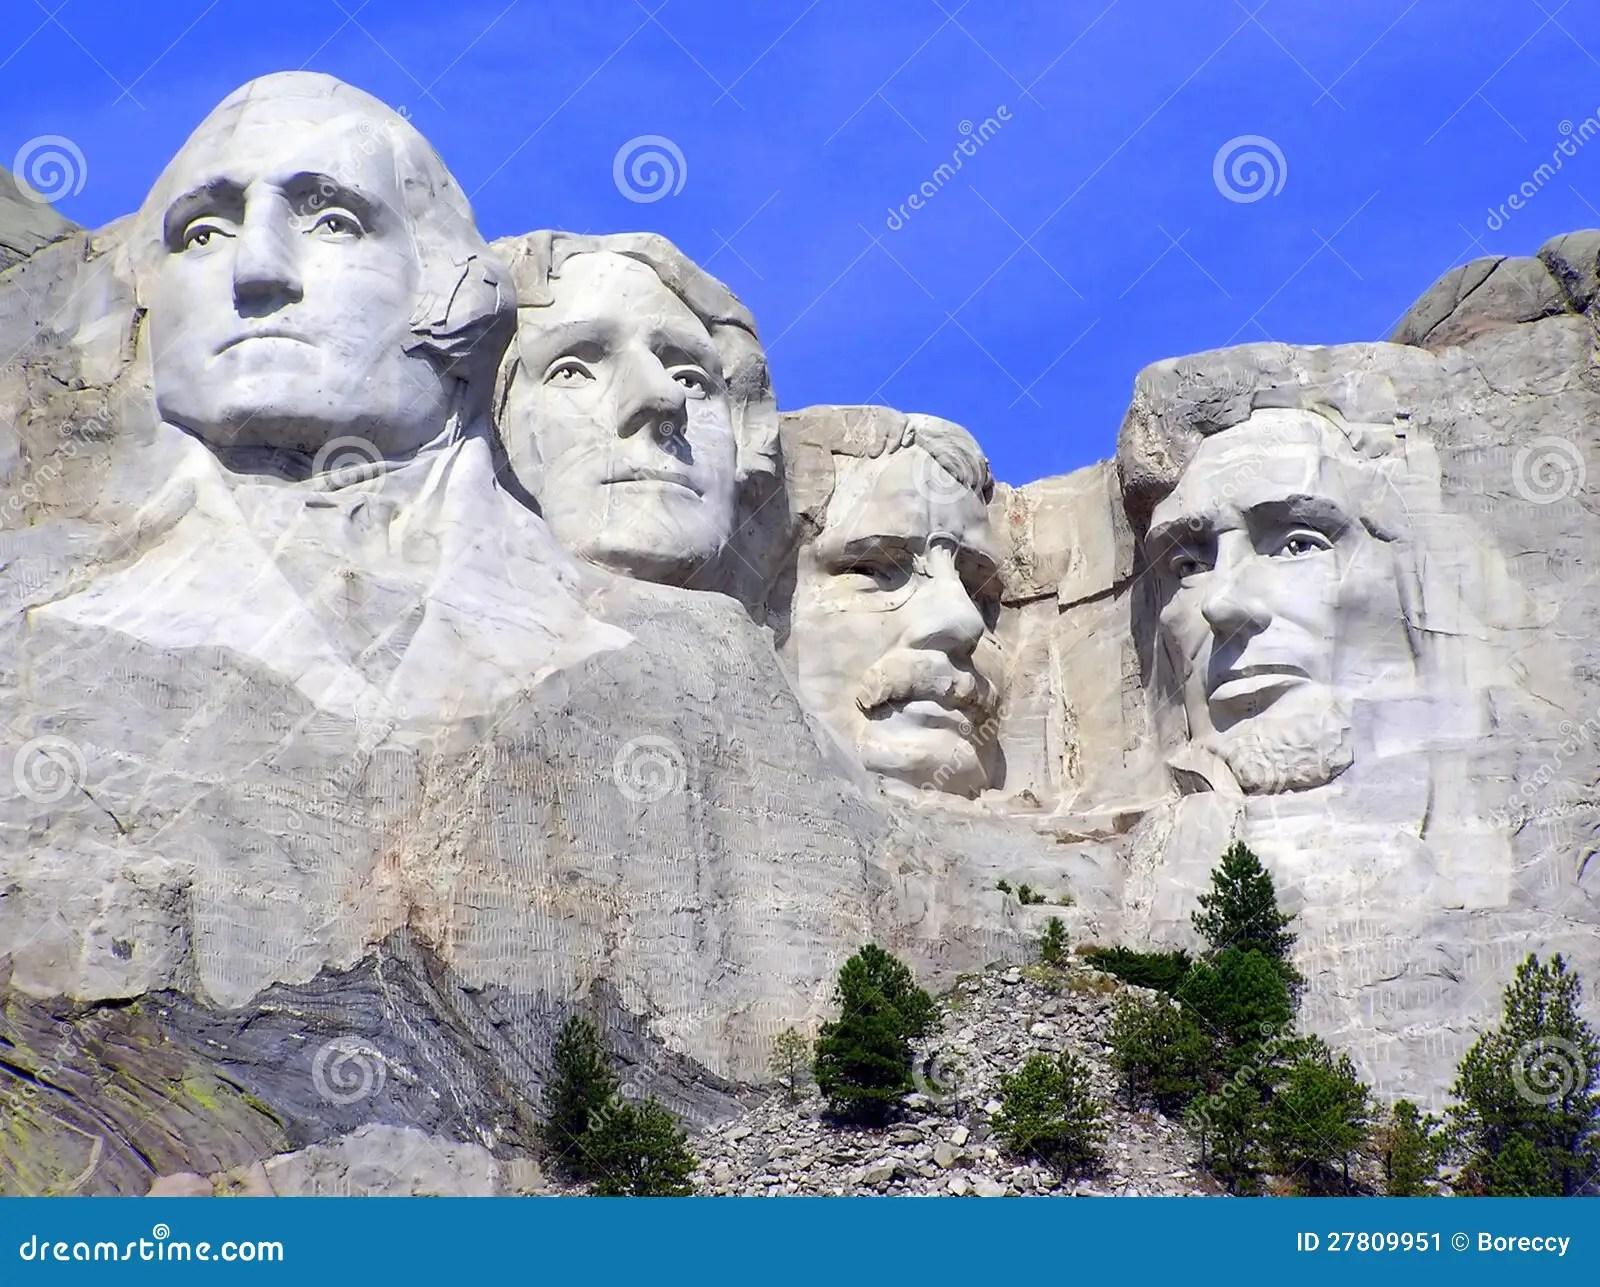 Mt Rushmore Sculpture Of Presidents South Dakota Stock